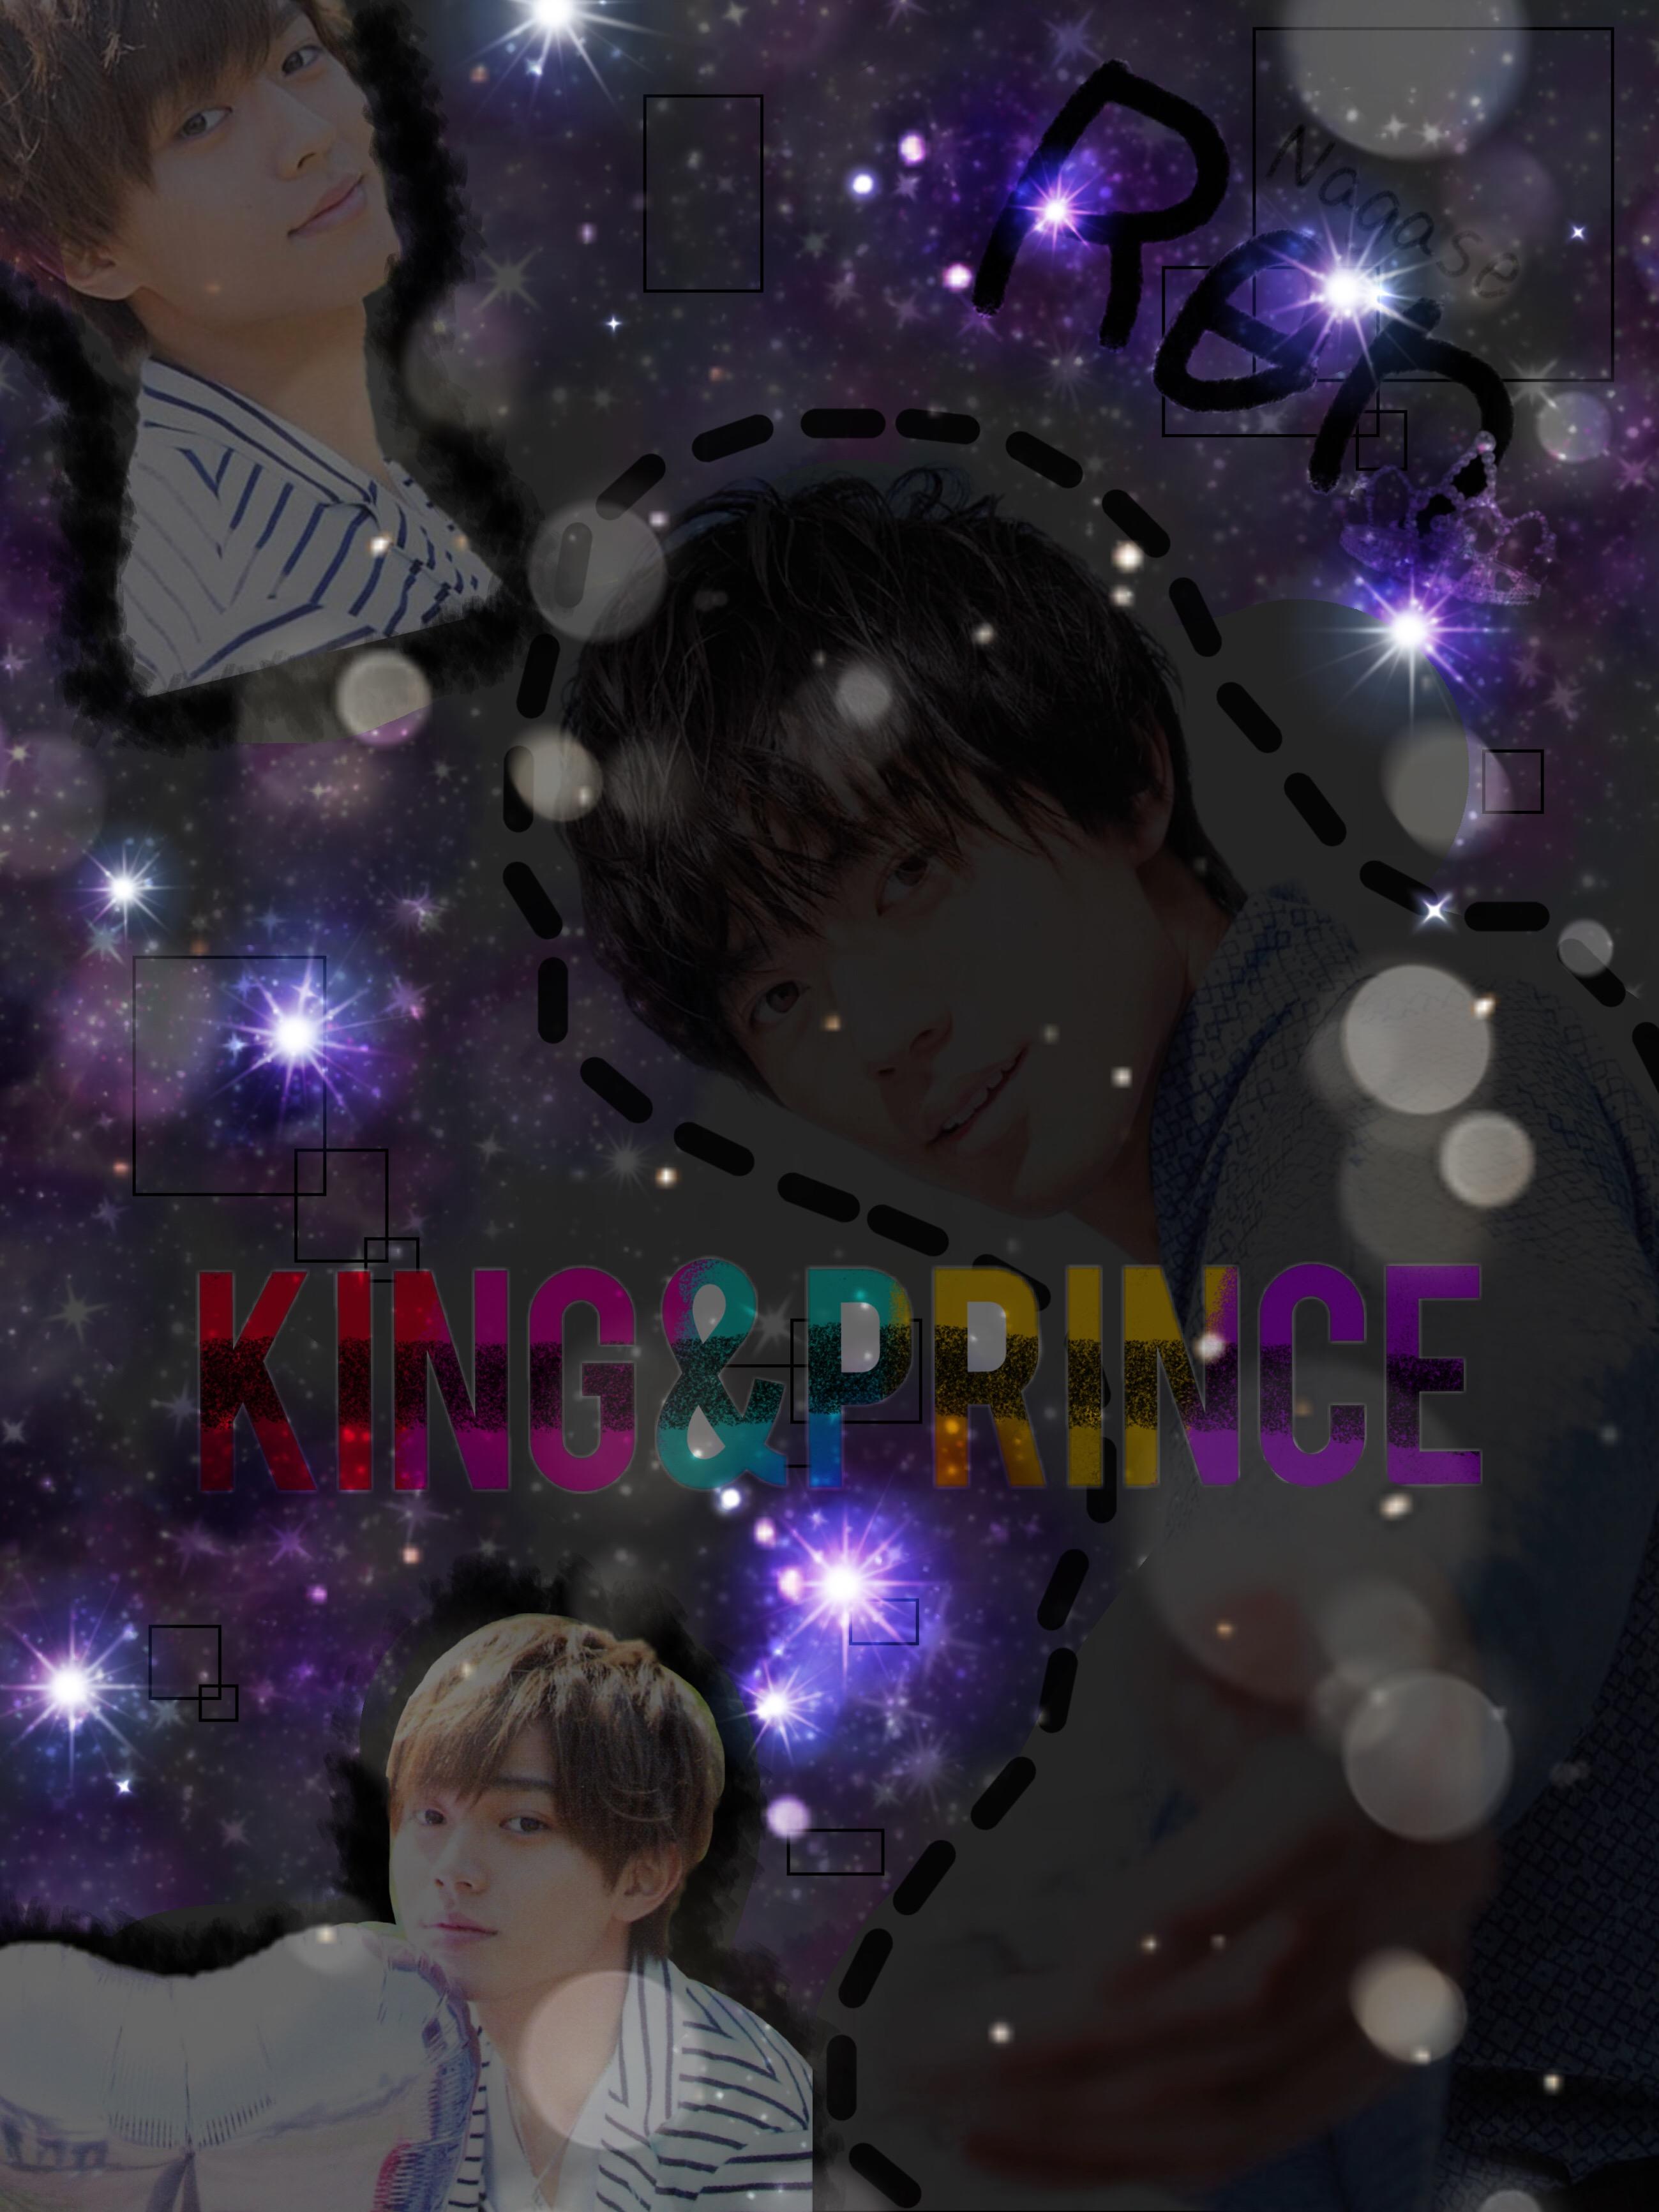 Freetoedit れんれんking Prince キンプリ壁紙永瀬廉漆黒暗い黒宇宙